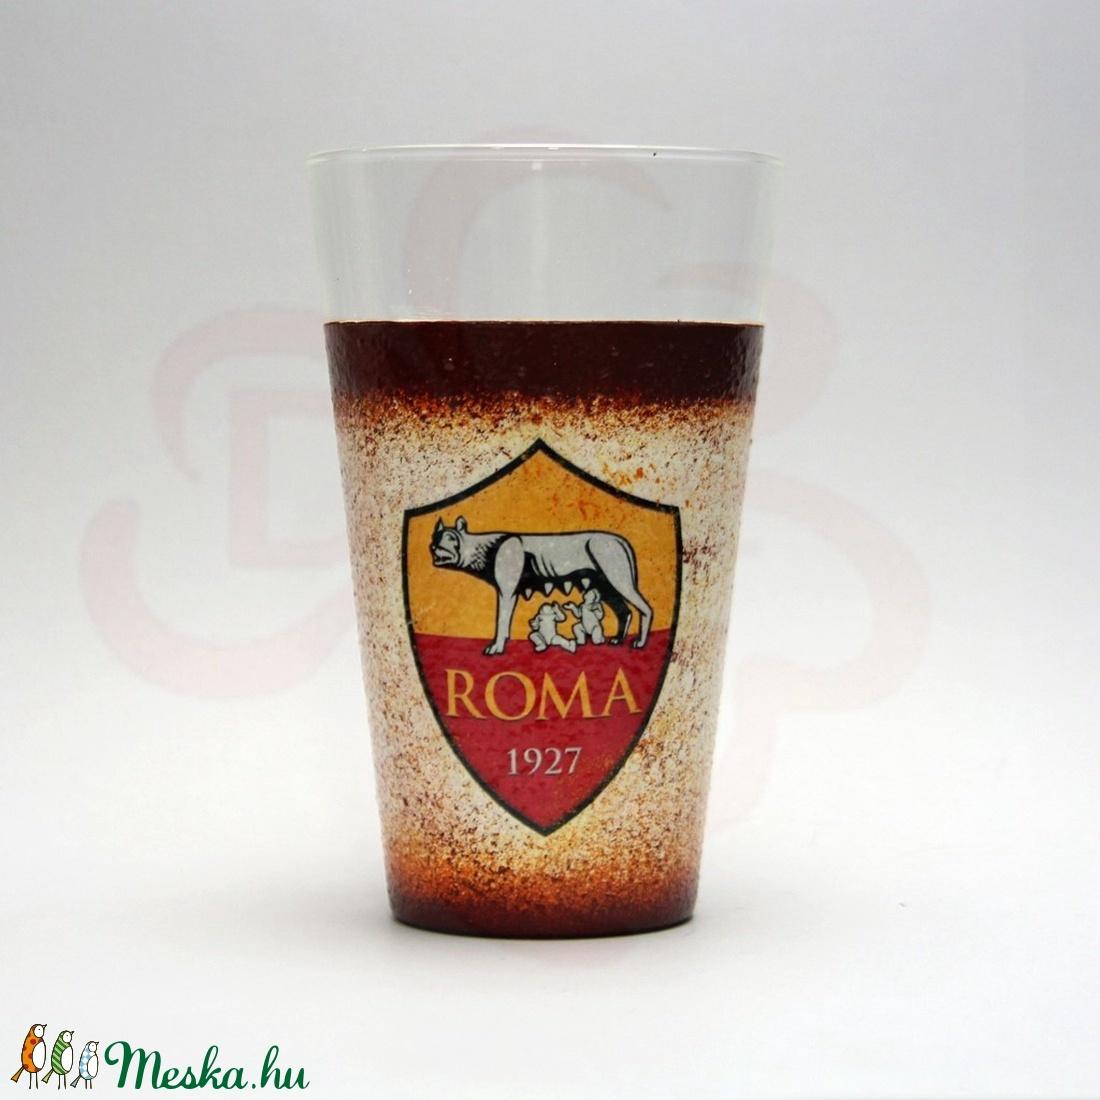 AS Roma vizes pohár ; As Roma foci szurkolóknak - Meska.hu